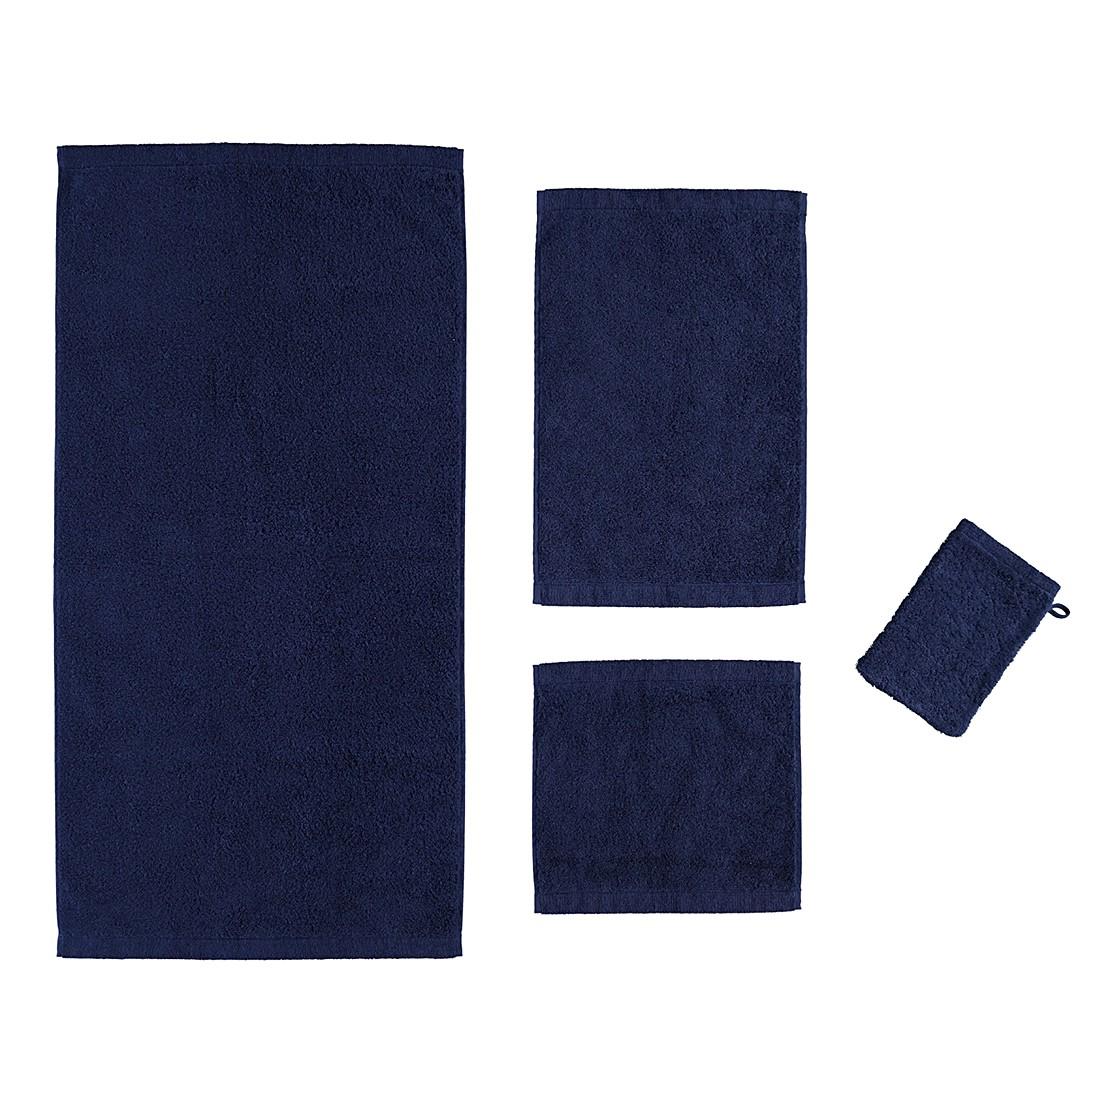 handt cher life style jacquard 7062 baumwolle kiesel. Black Bedroom Furniture Sets. Home Design Ideas